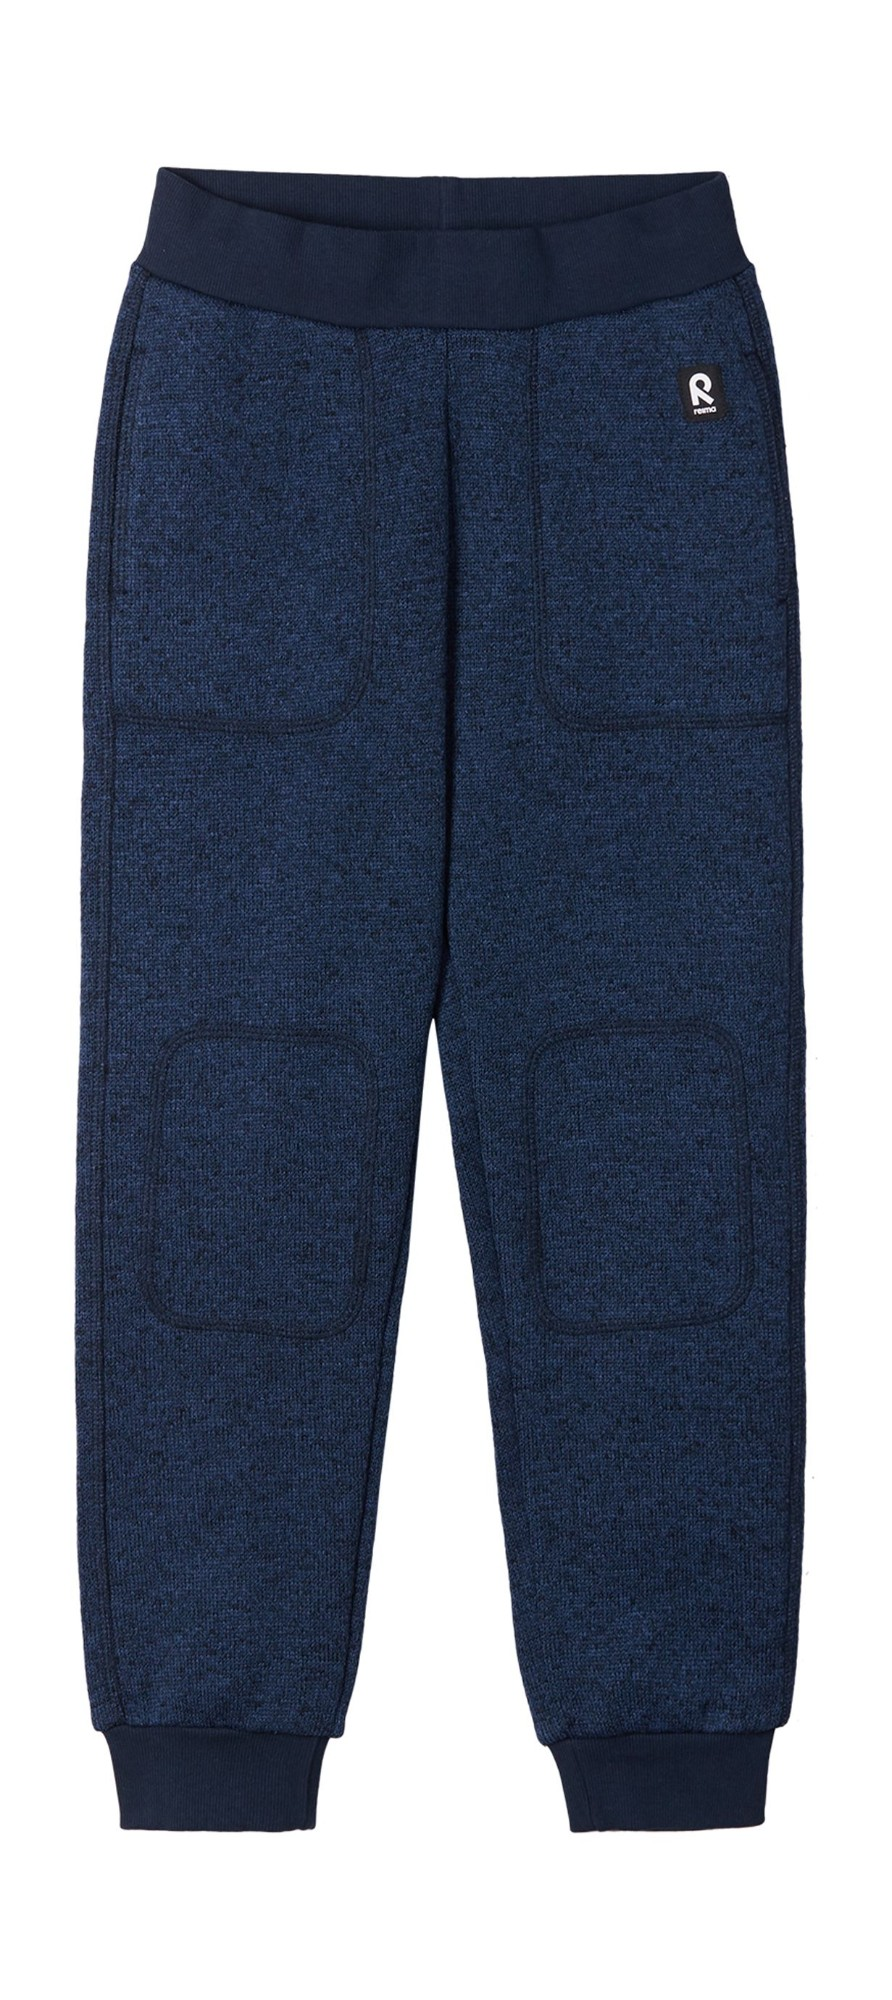 REIMA Sangis 536653 Jeans Blue 116